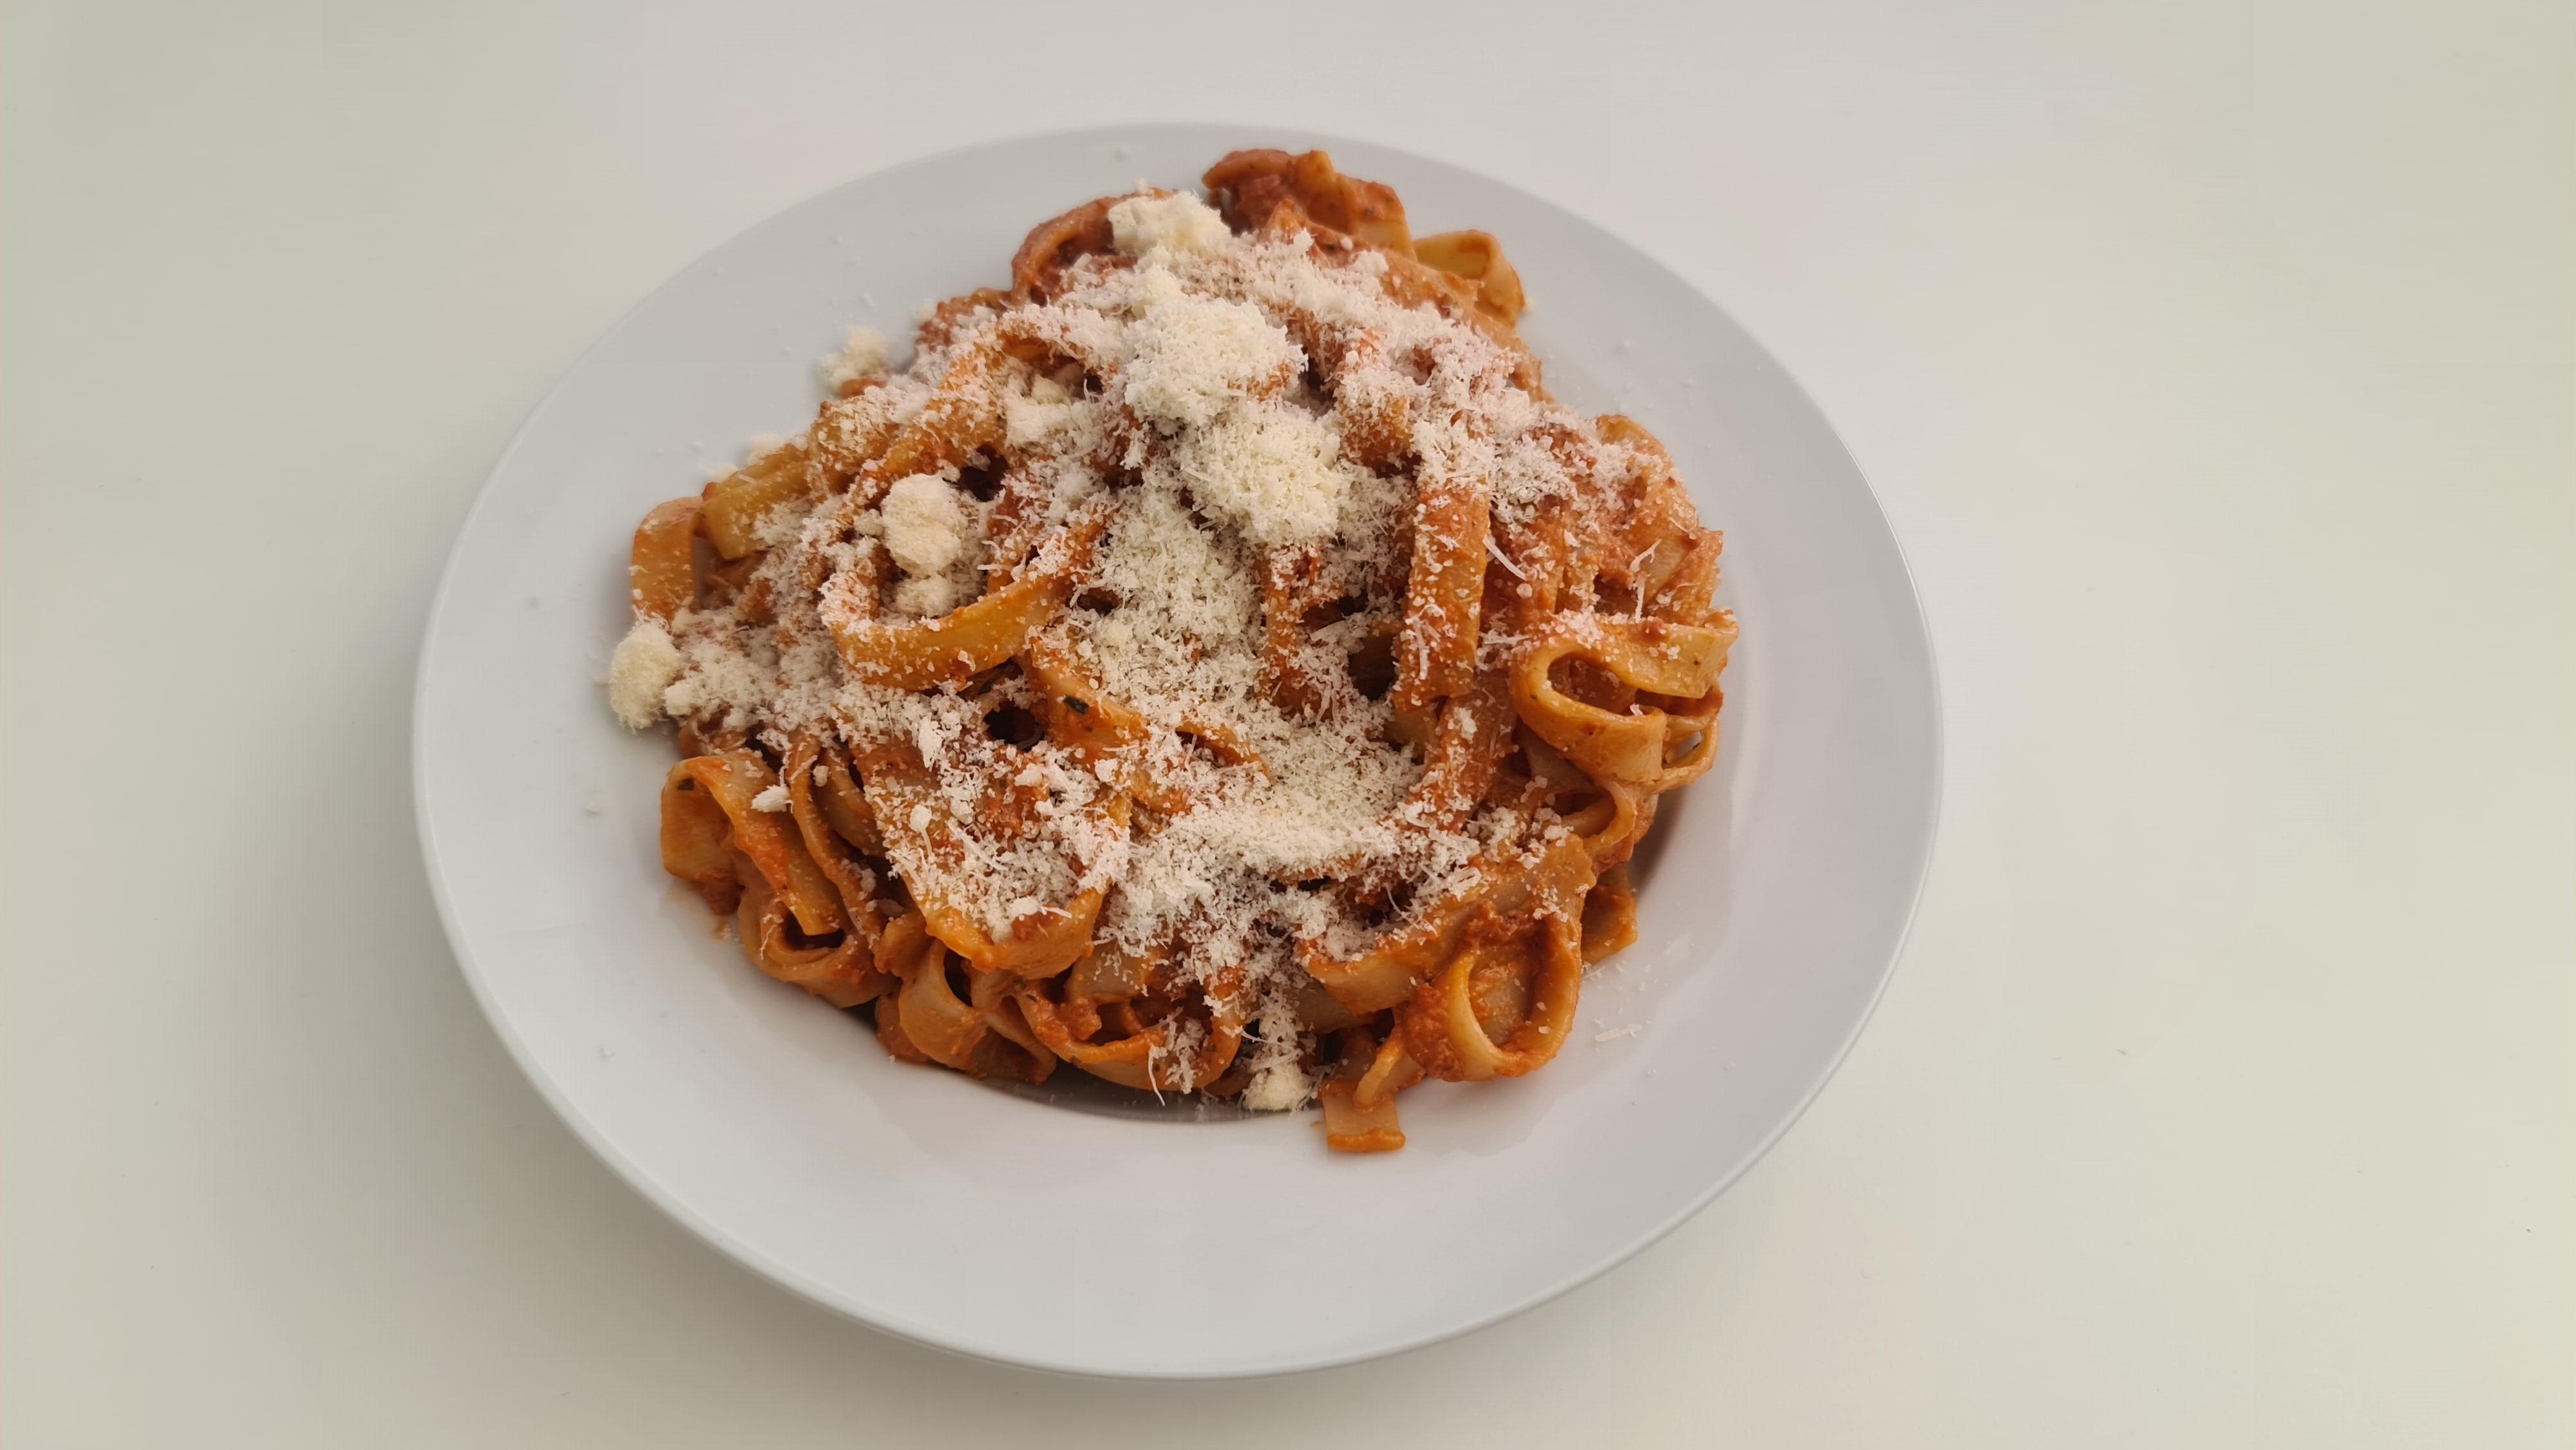 https://foodloader.net/Holz_2020-06-01_Tagliatelle_Pomodori_Secchi.jpg